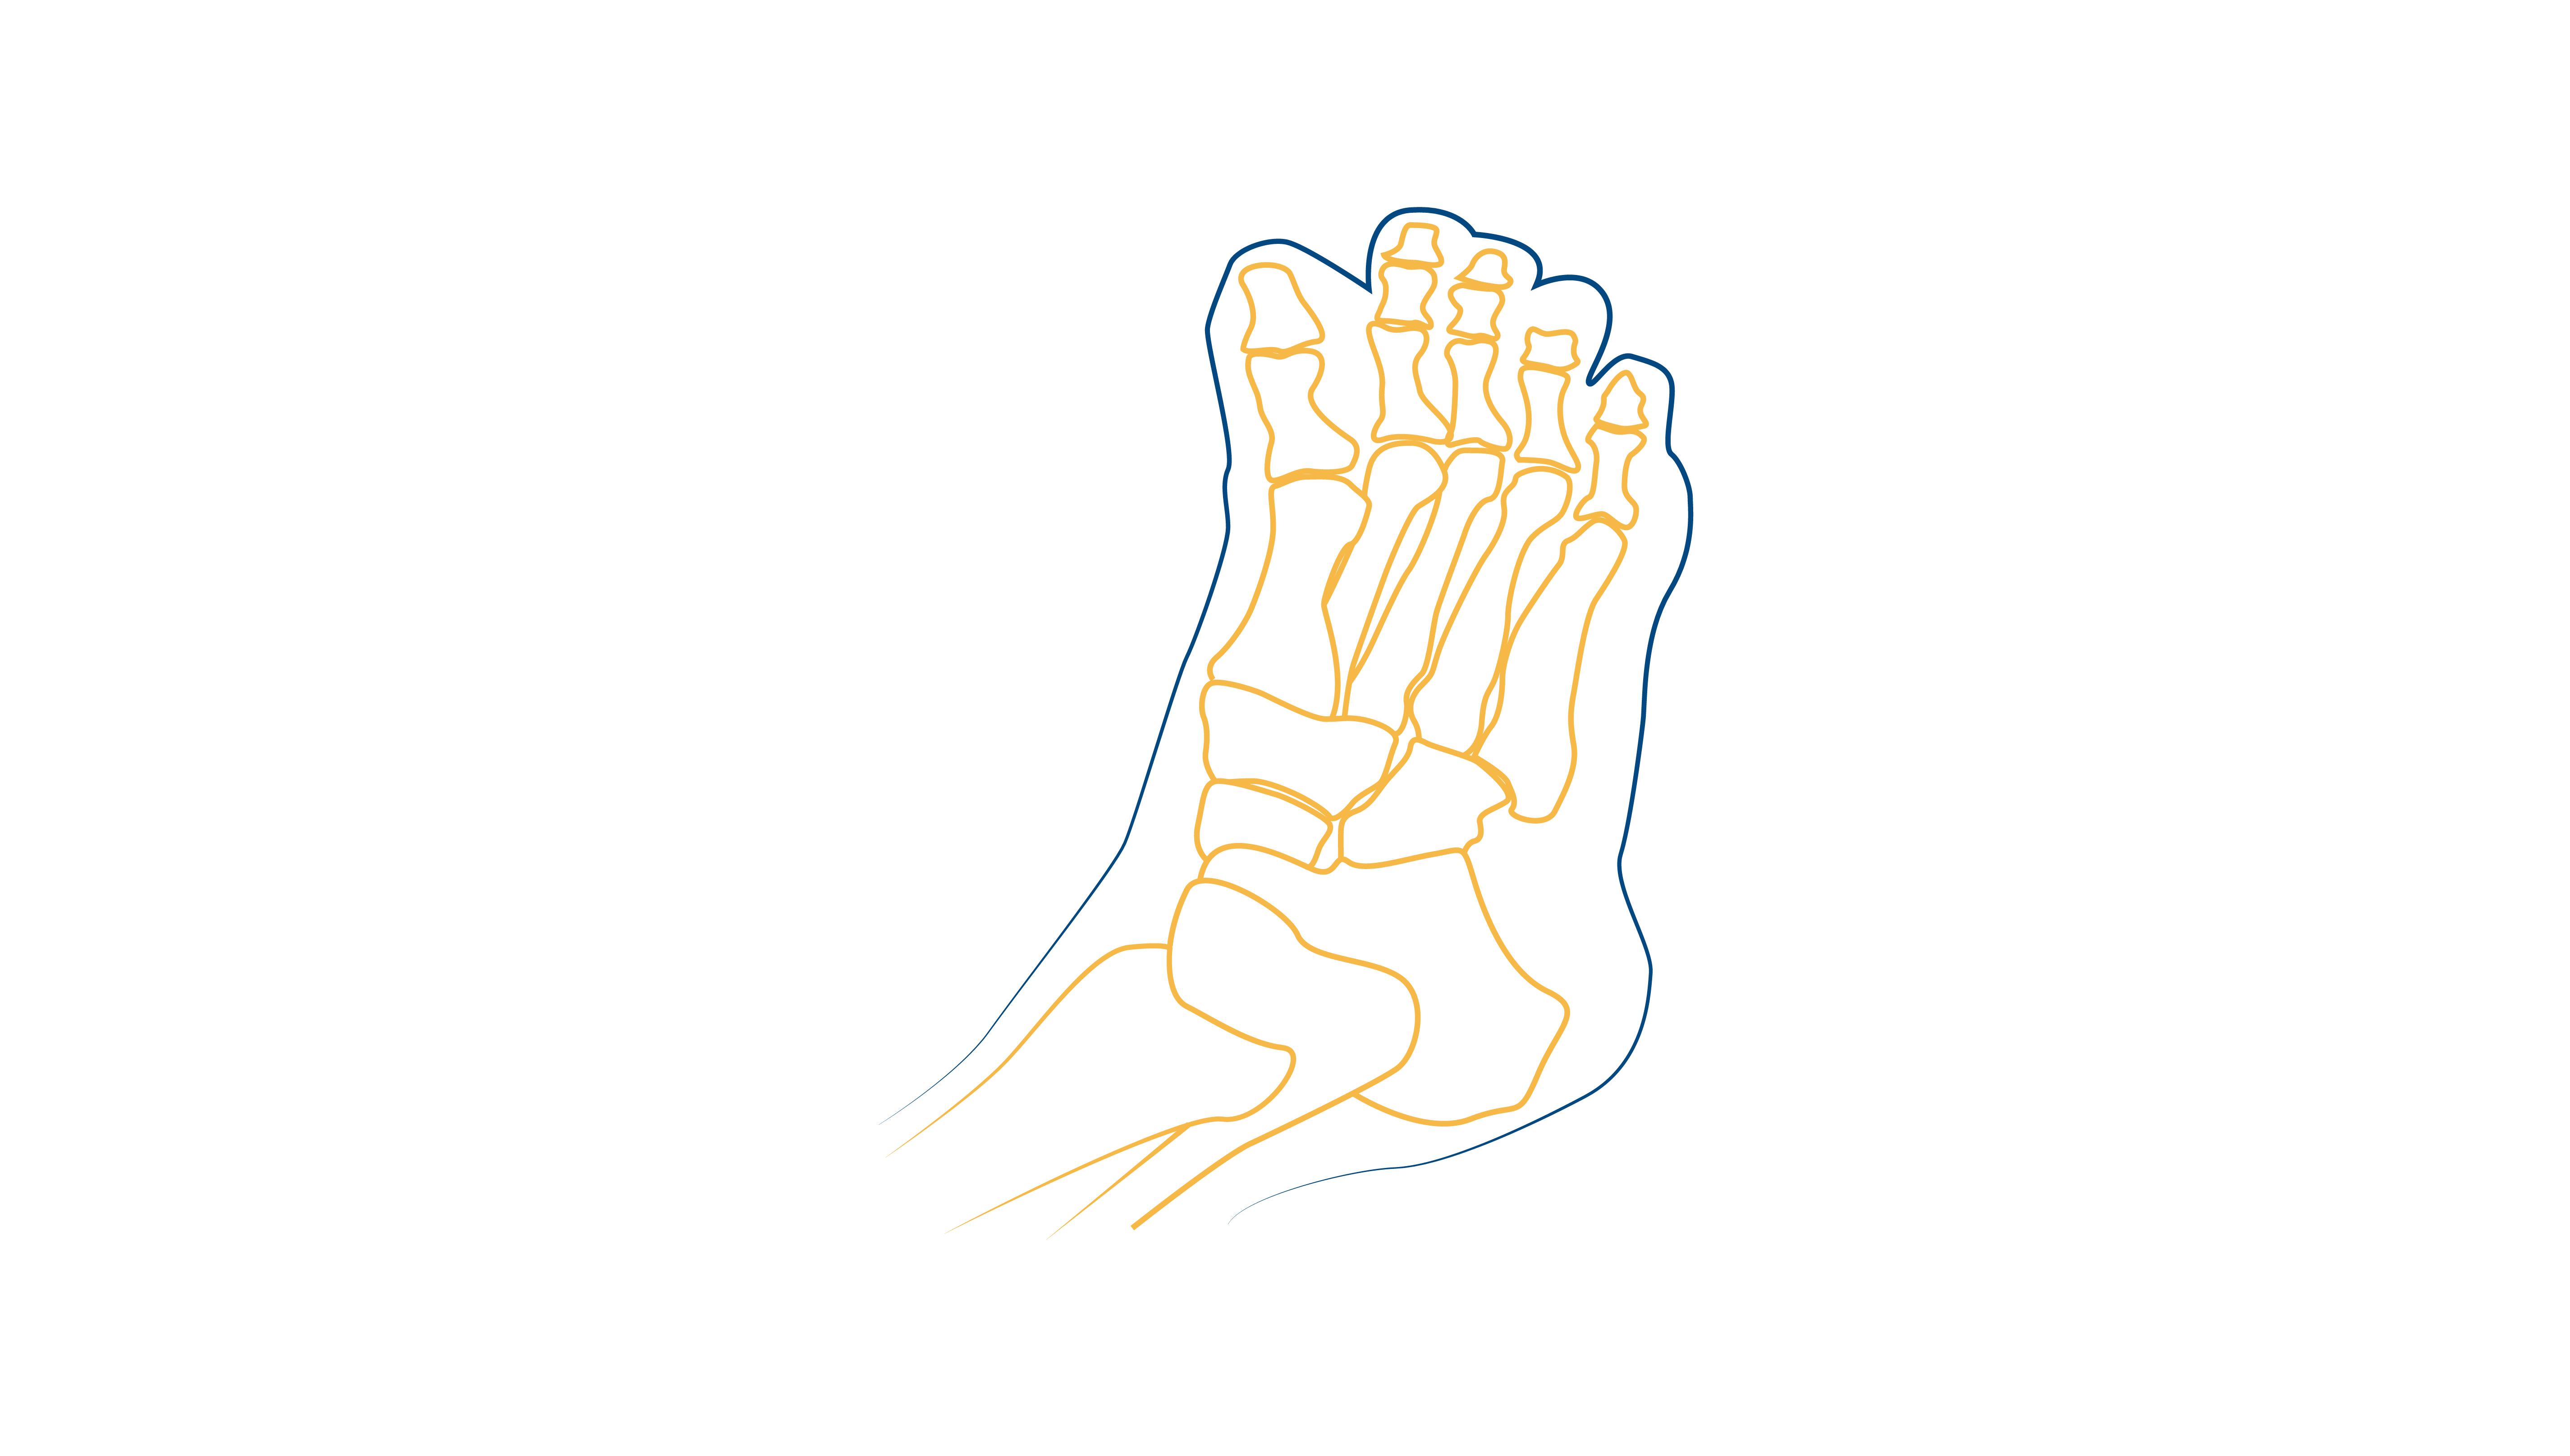 Blog-CEAPIE-artrosis-en-los-pies (3)